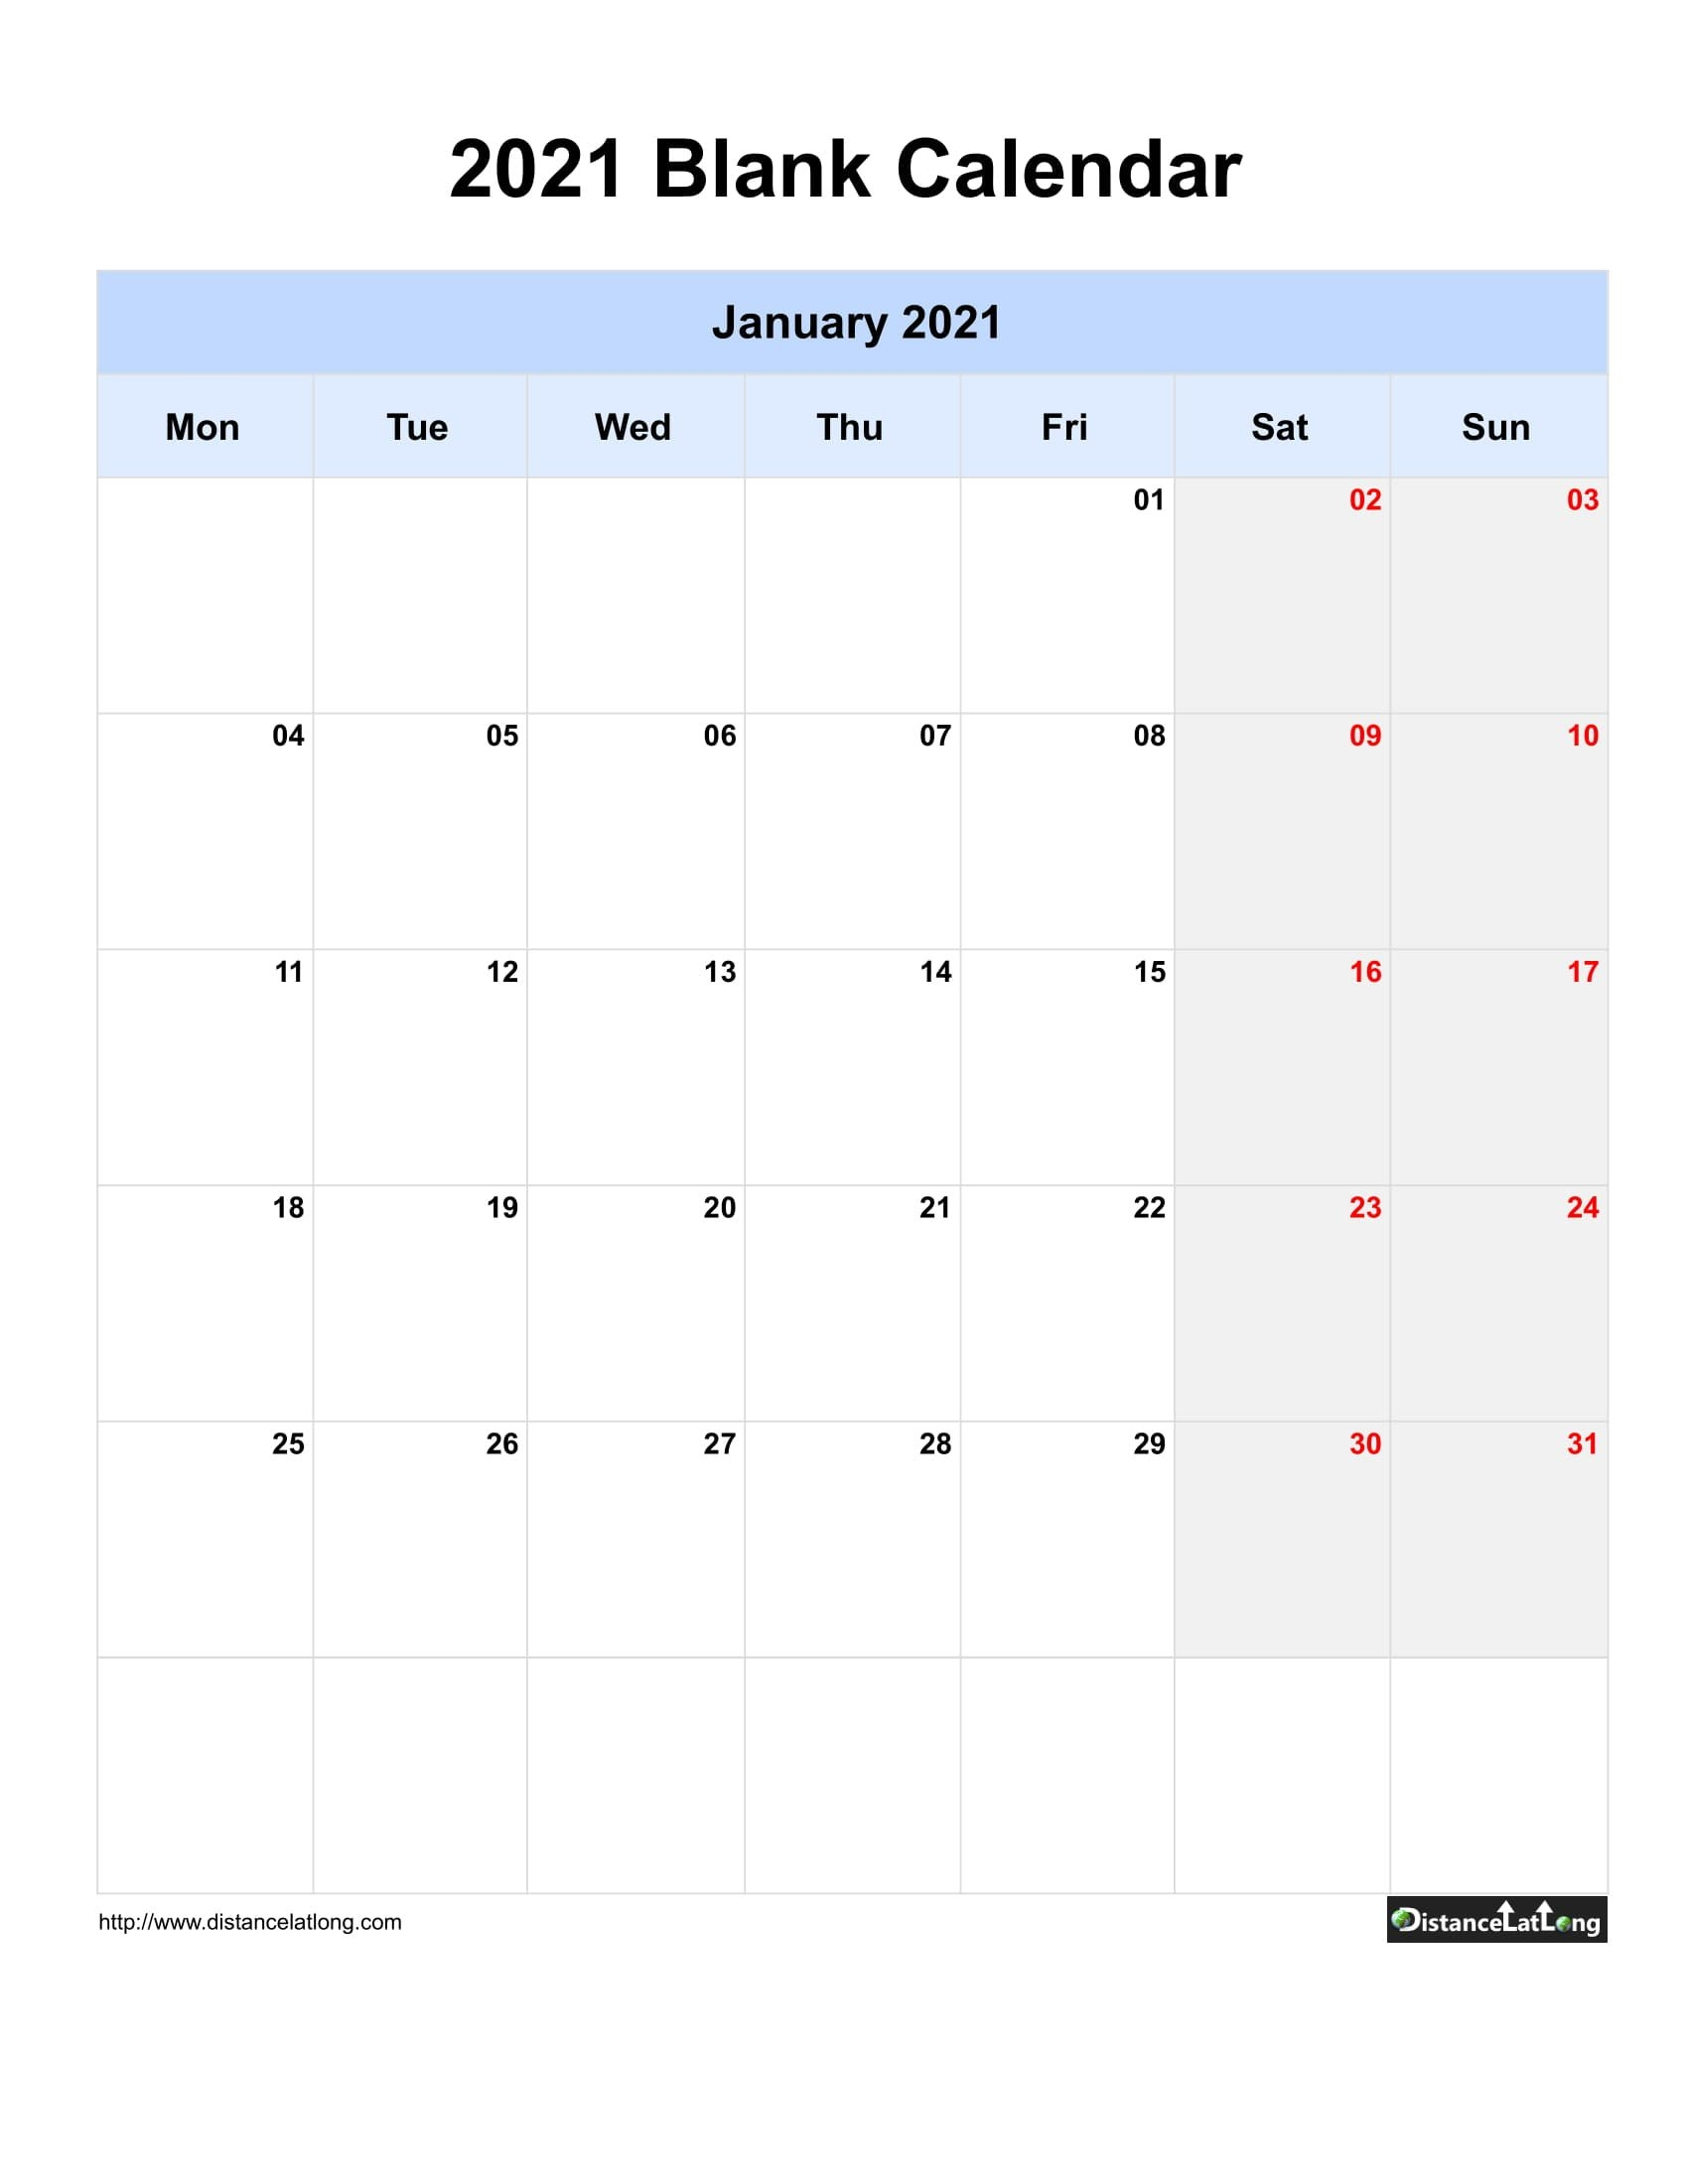 2021 yearly calendar free printable pdf, words and jpg